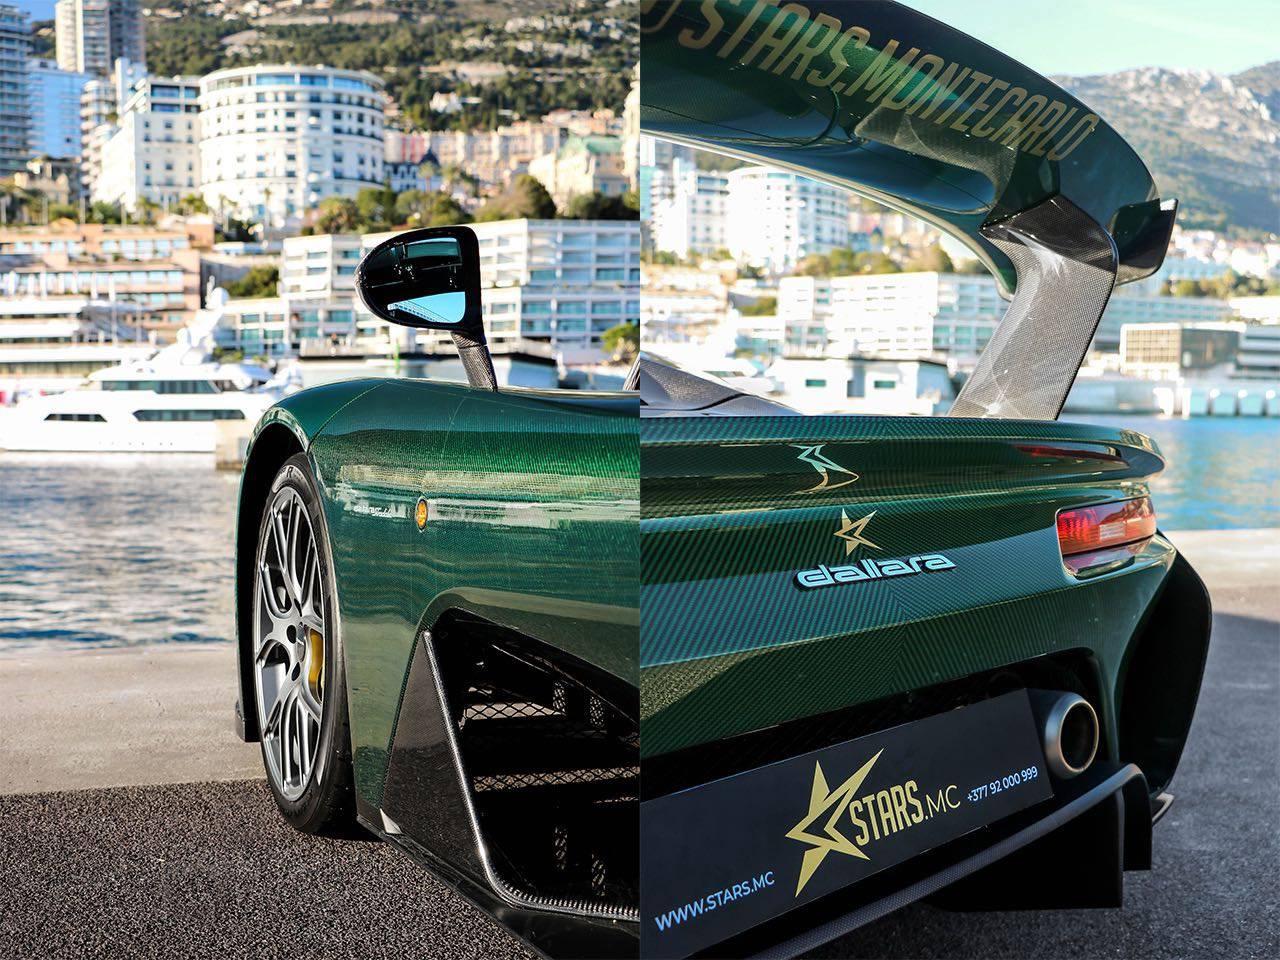 Dallara-Stradale-Convertible-Carbon-13